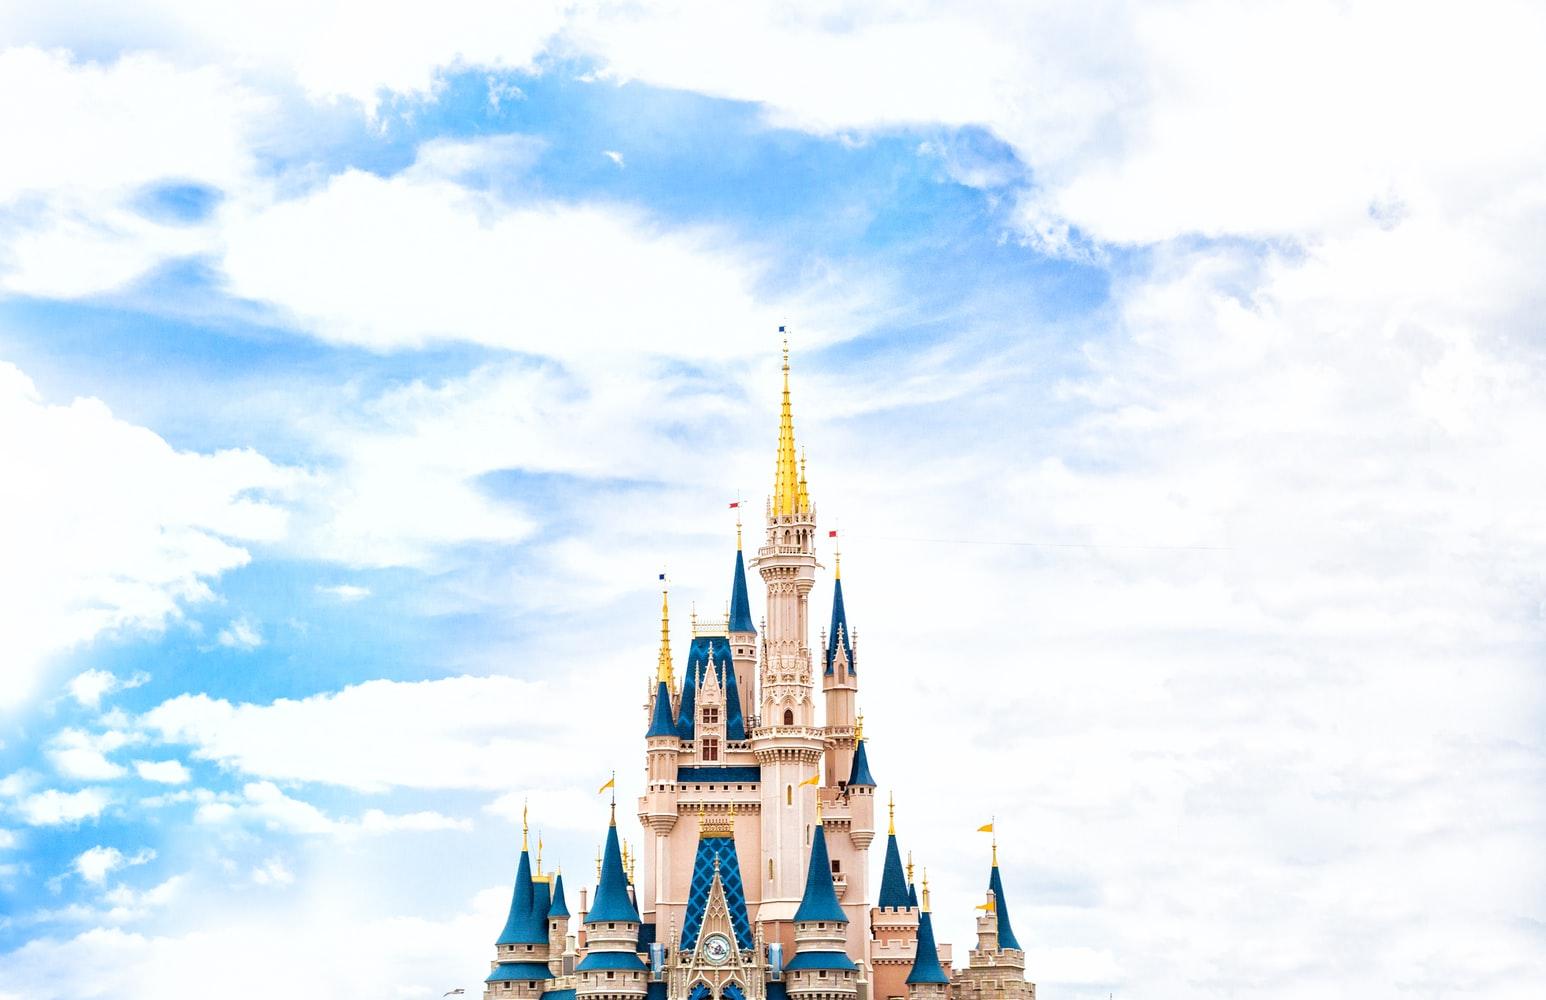 Cinderella's Castle at Walt Disney World in Orlando